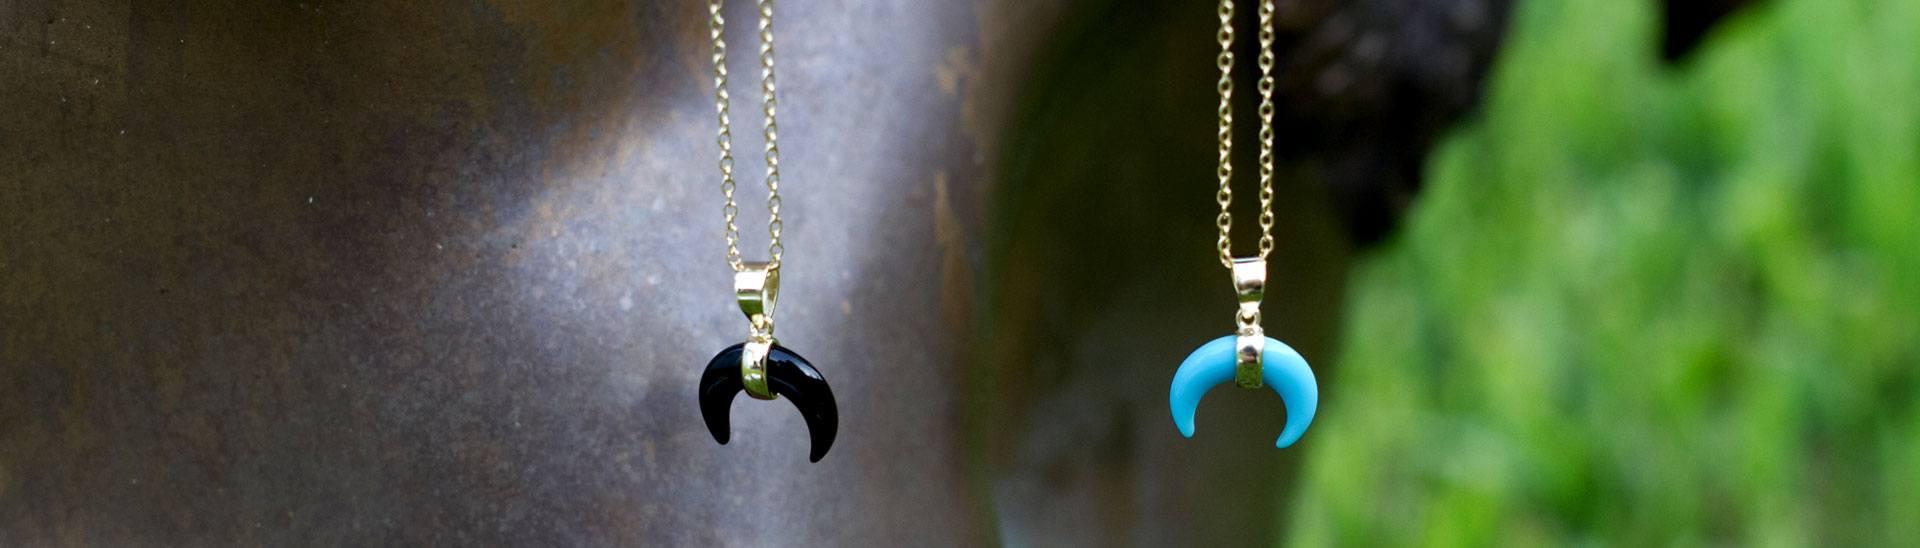 boho jewelry bella boho